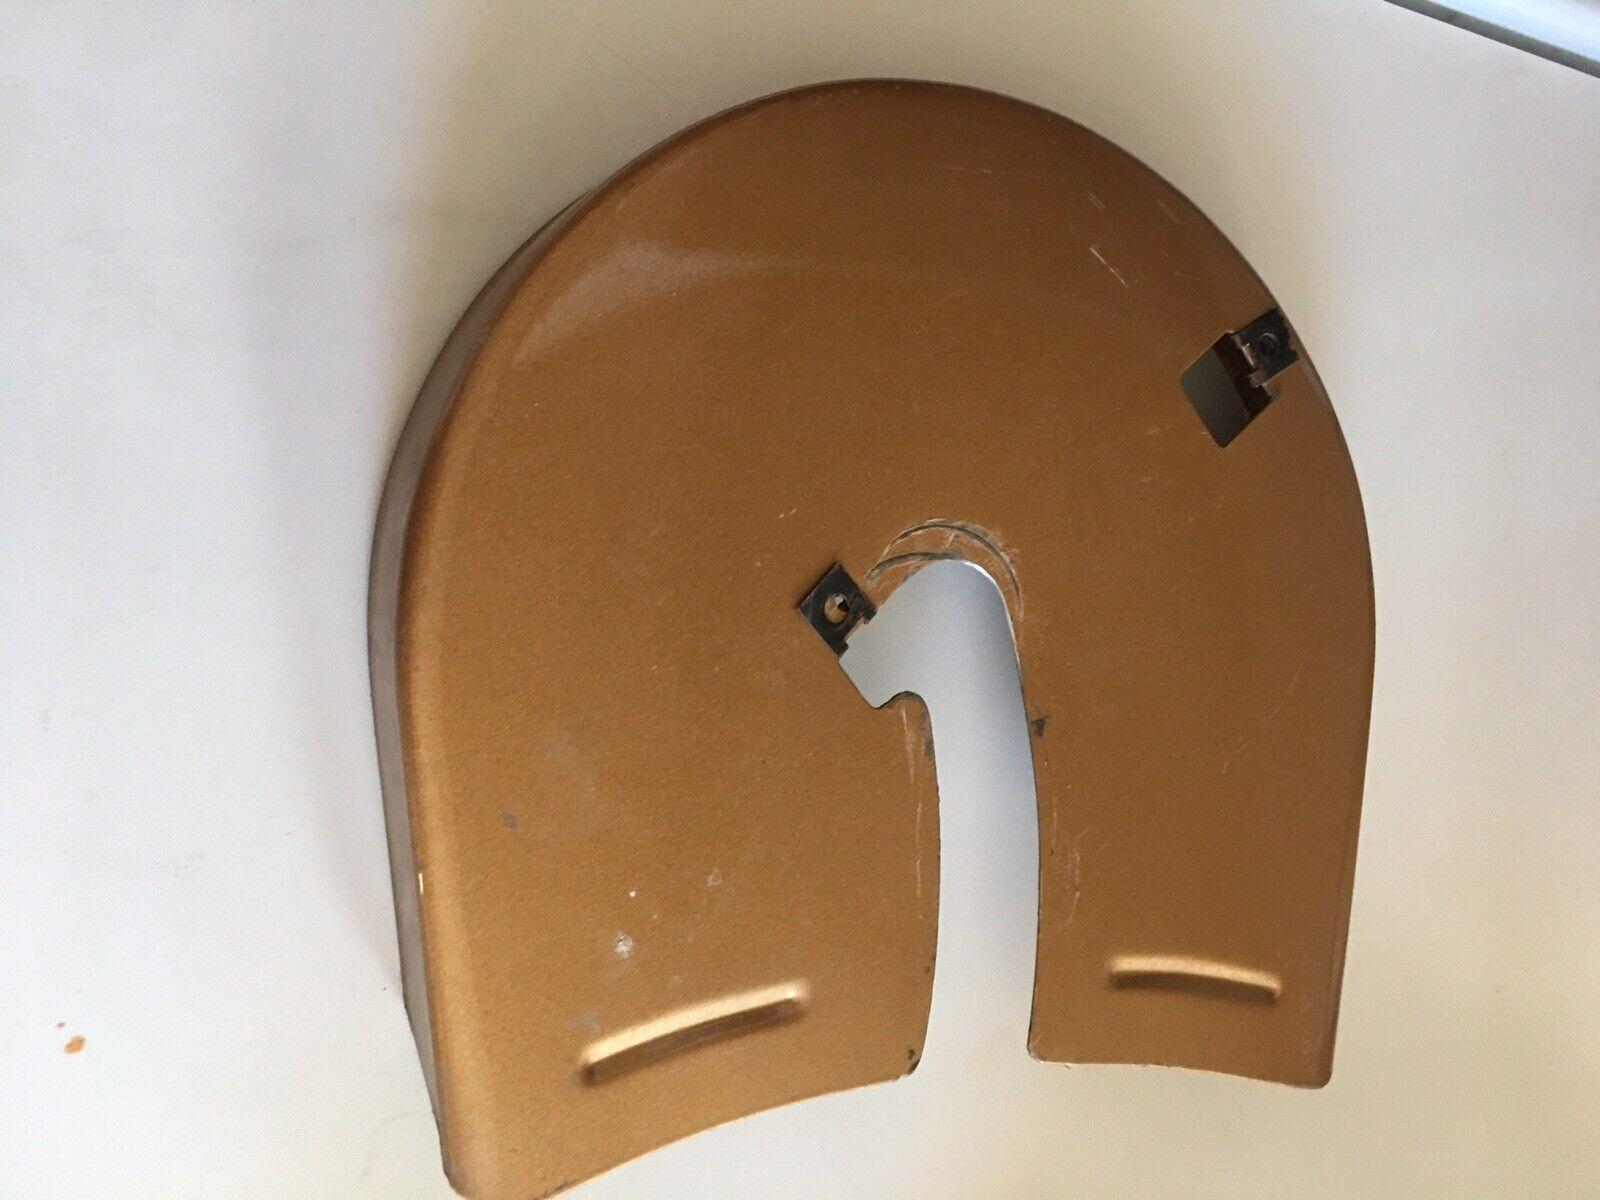 End Caps endhülsen 10 Piece for Brake Cable Shift Cable Bike Tuning Parts